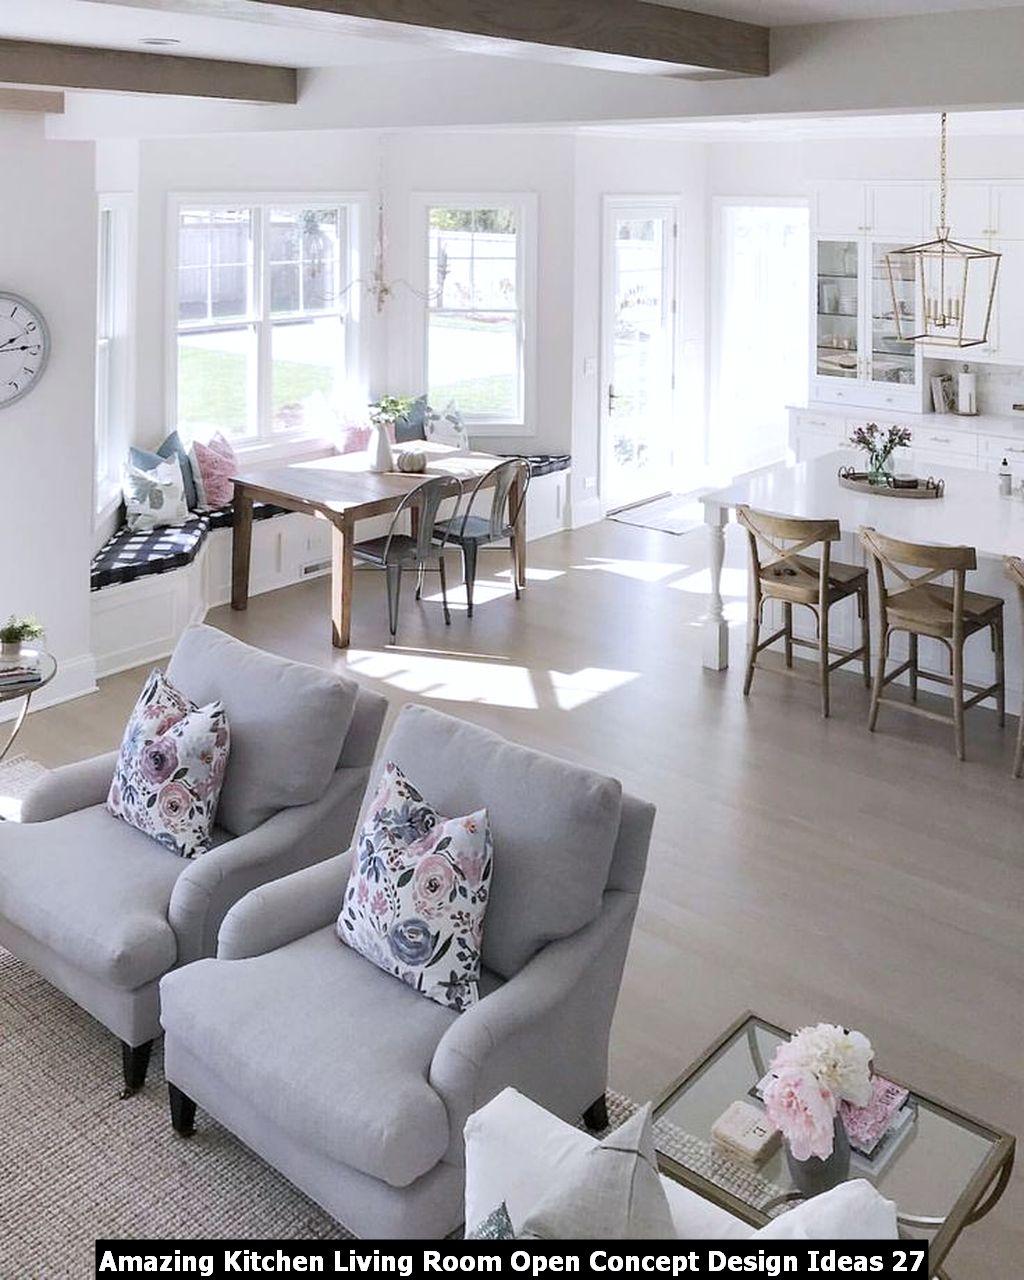 Amazing Kitchen Living Room Open Concept Design Ideas 27